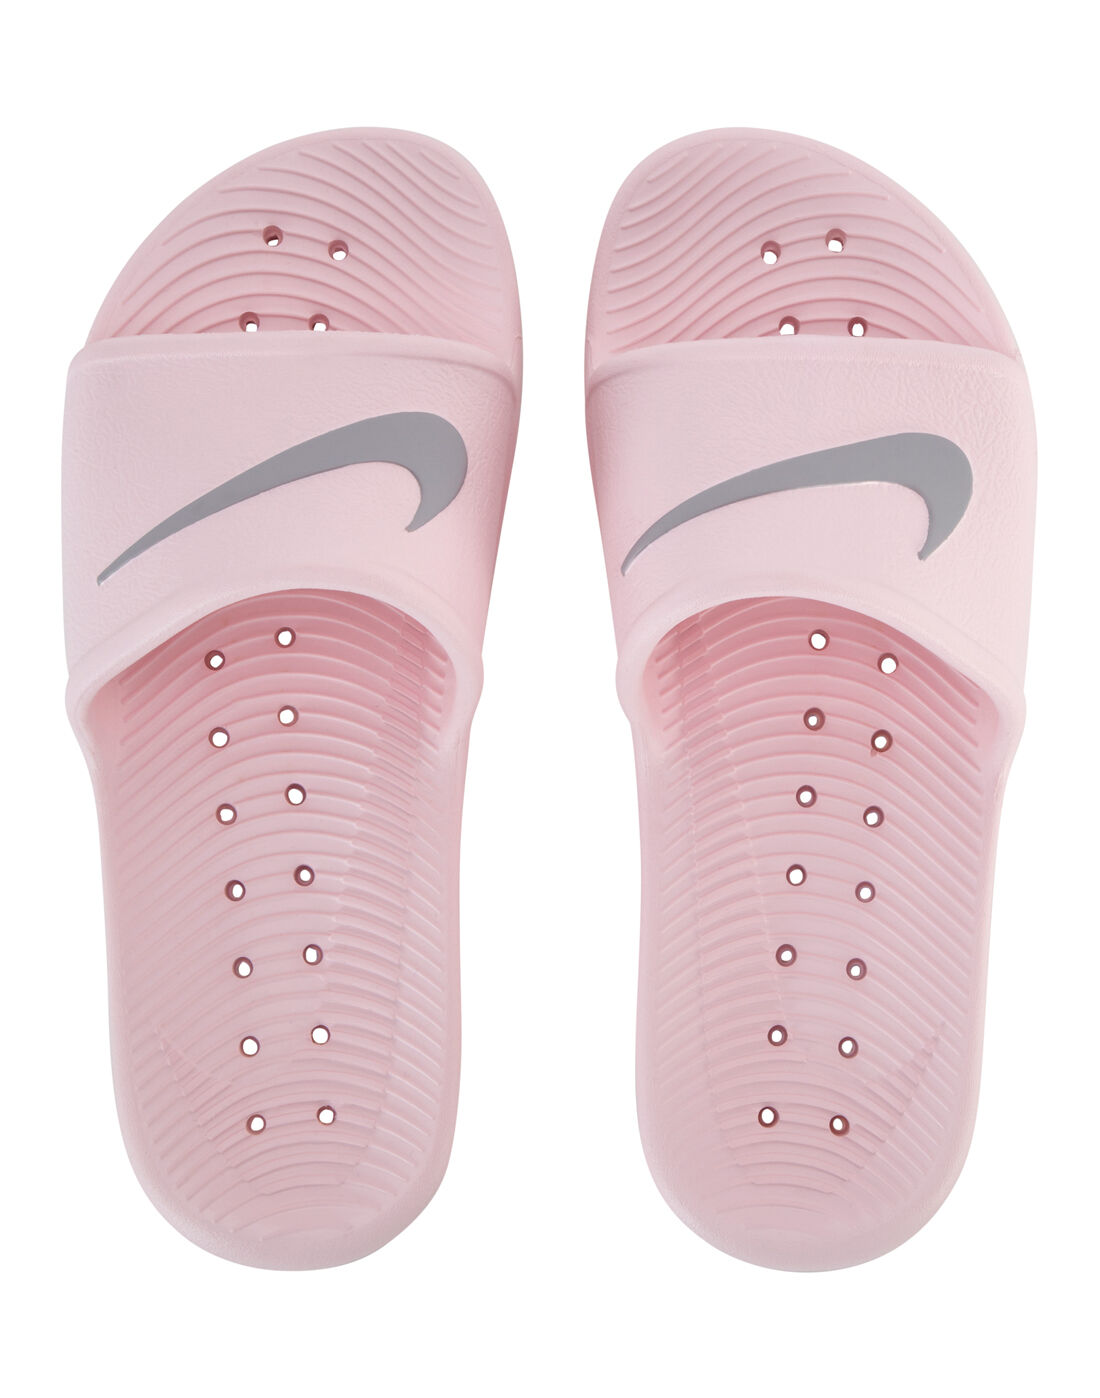 Nike Womens Kawa Shower Slides - Pink